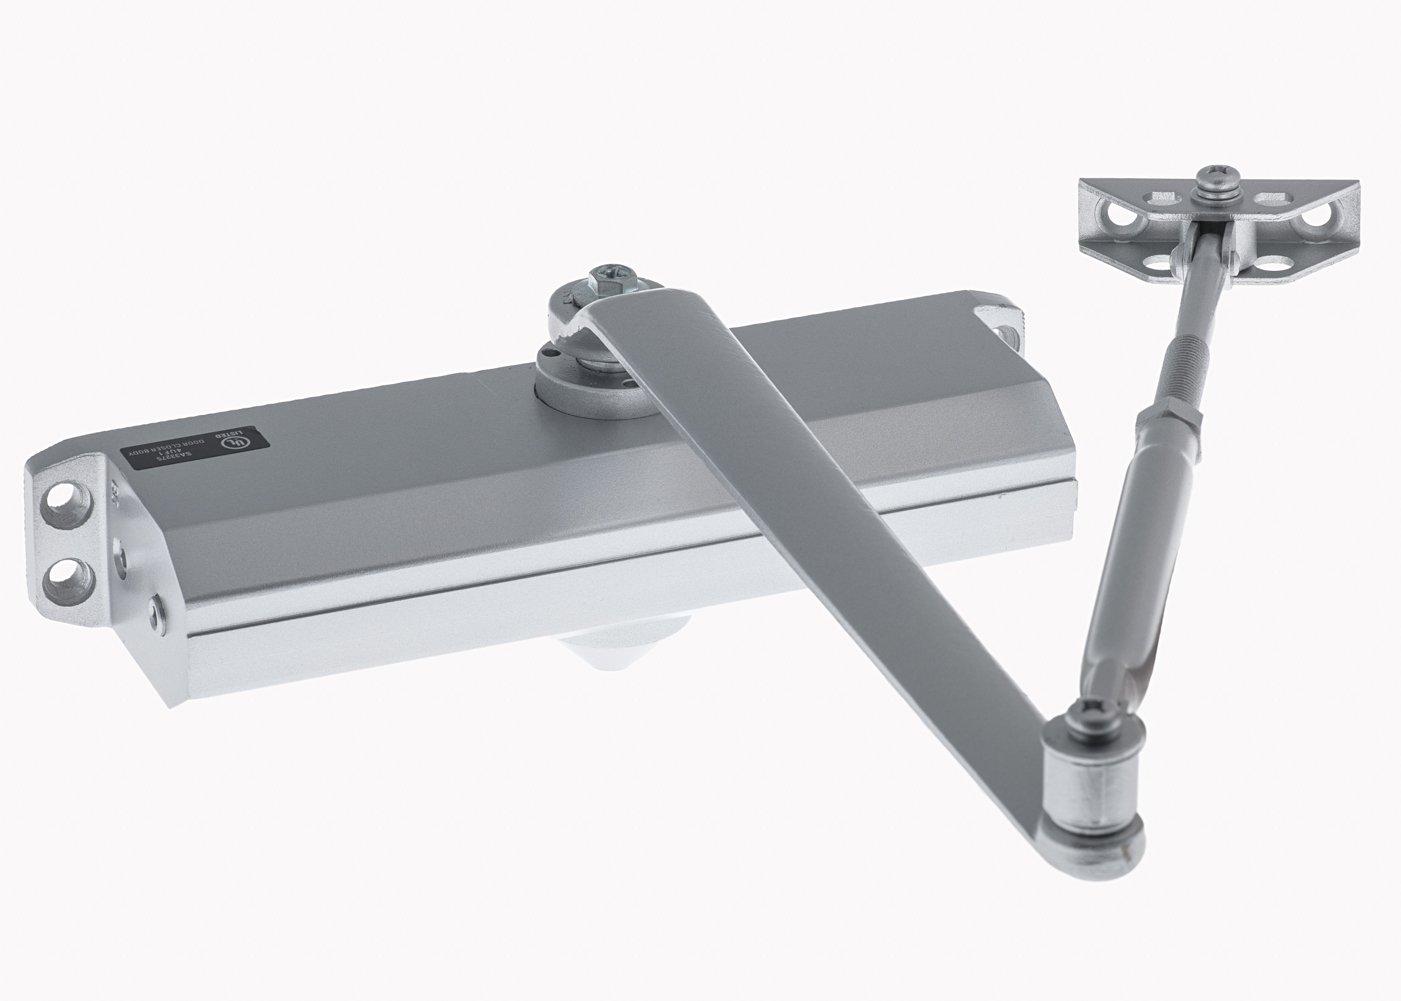 Medium/Heavy Duty Grade 1 Commercial Cast Aluminum Door Closer, Lawrence Hardware Model LH5016 - for high-traffic entrances/doorways. Norton 1600 Footprint by Lawrence Hardware (Image #2)